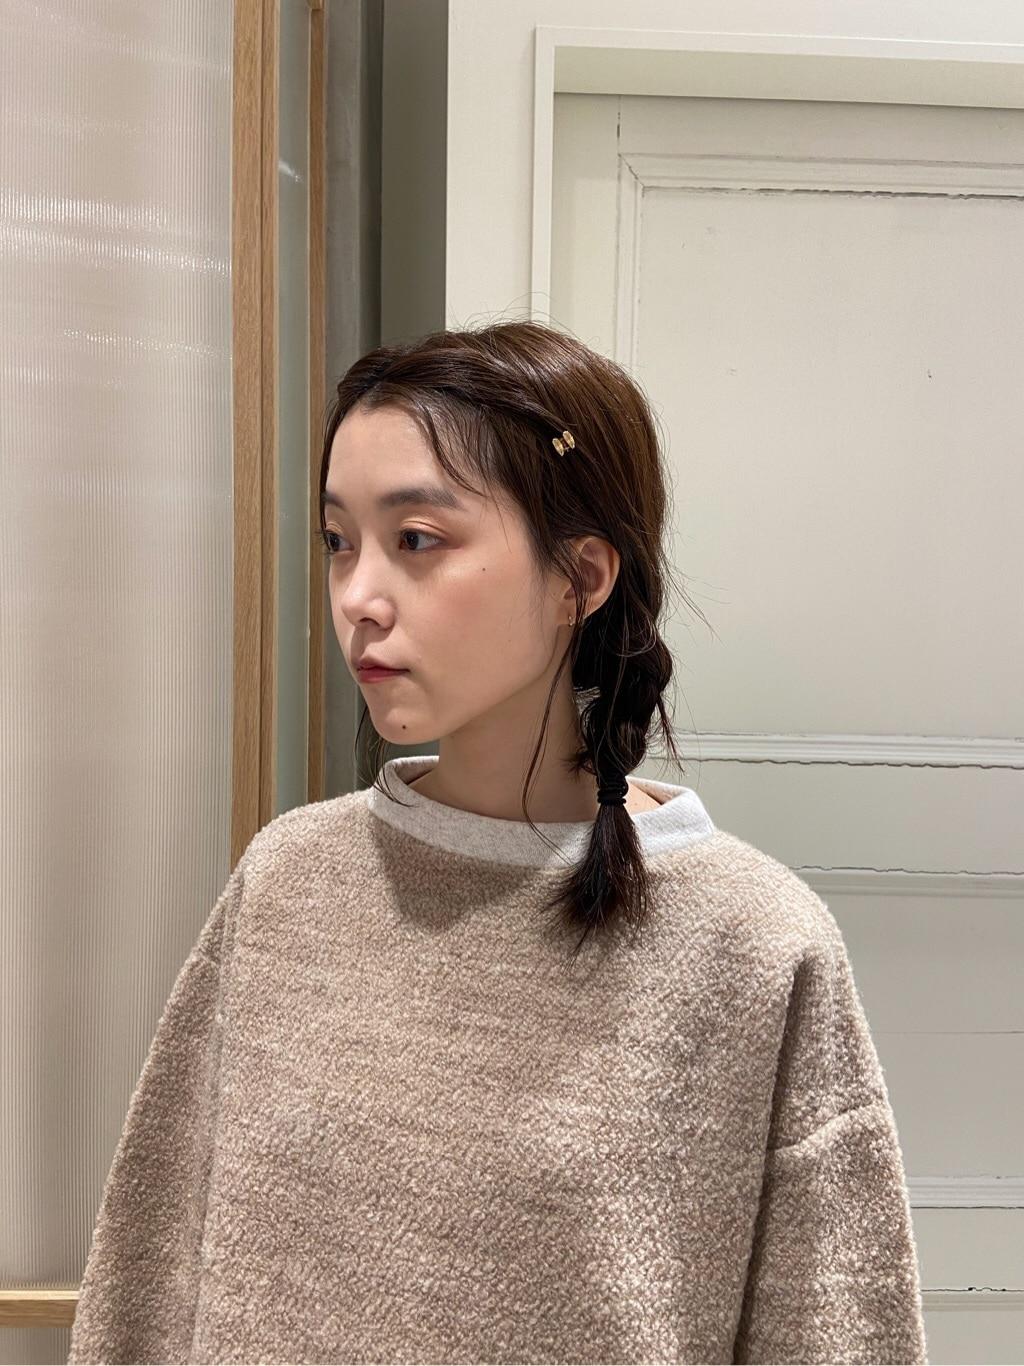 bulle de savon 渋谷スクランブルスクエア 身長:153cm 2020.11.17